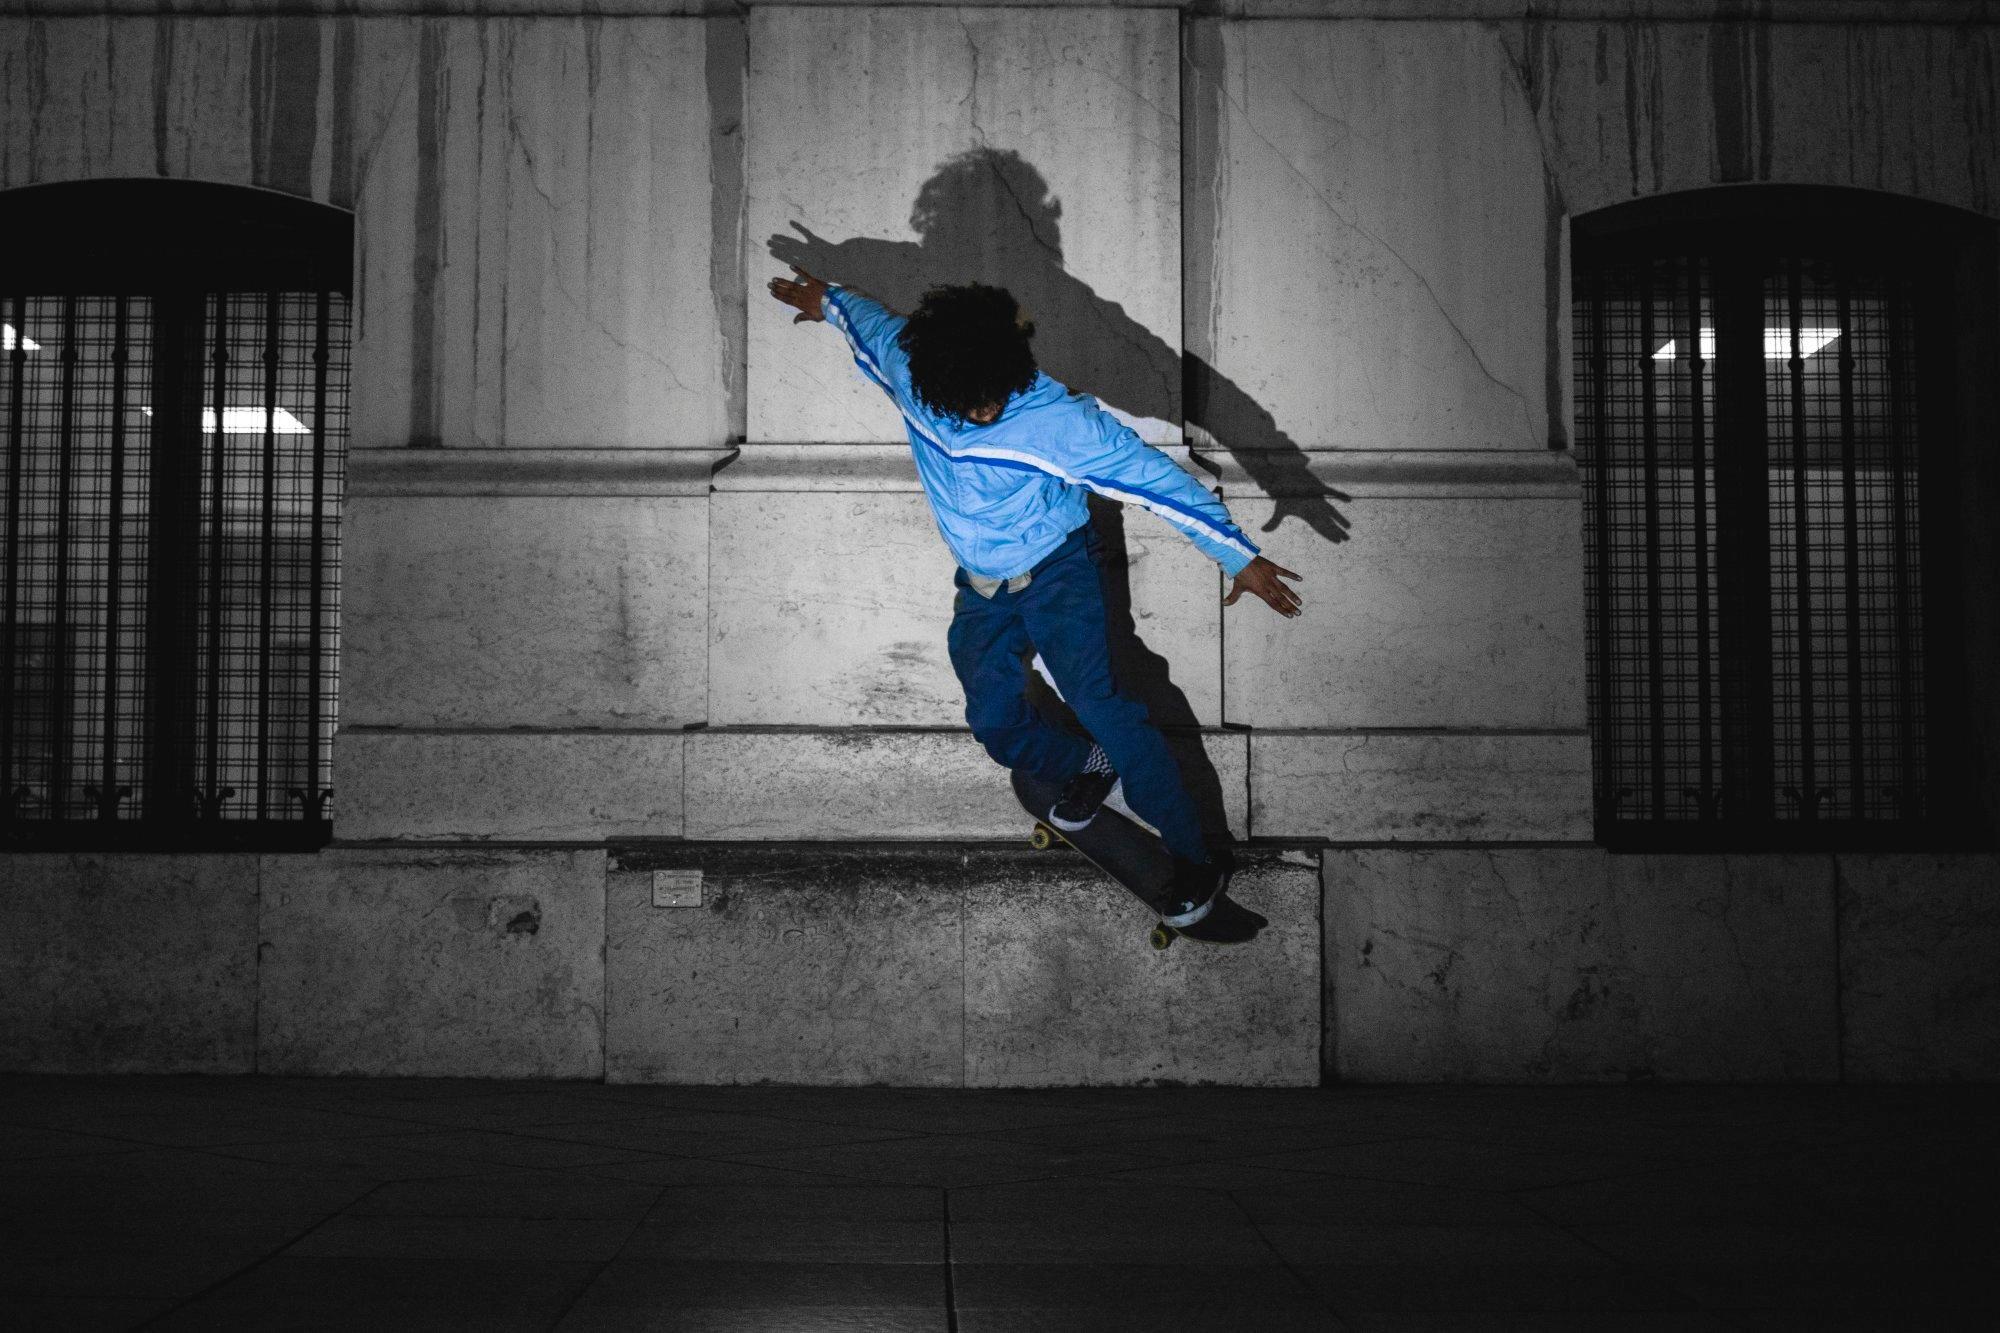 smith-noir-blanc-marseille-skate-photographe-professionnel